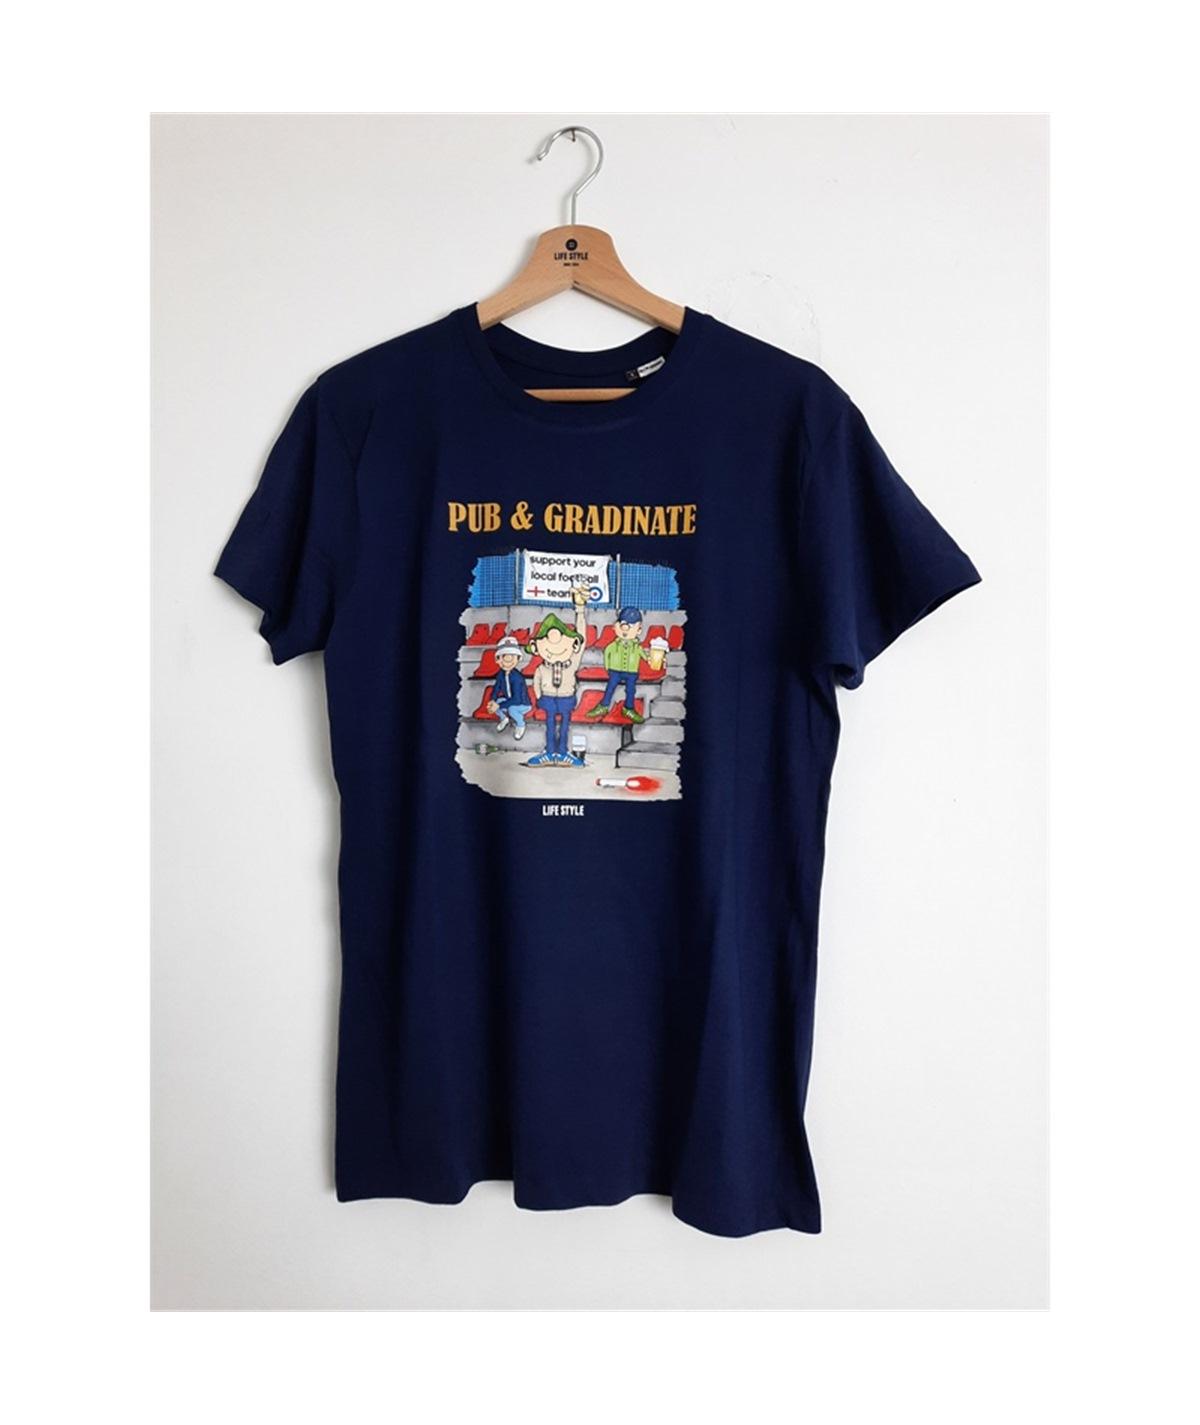 T-shirt pub e gradinate life style blu navy 1